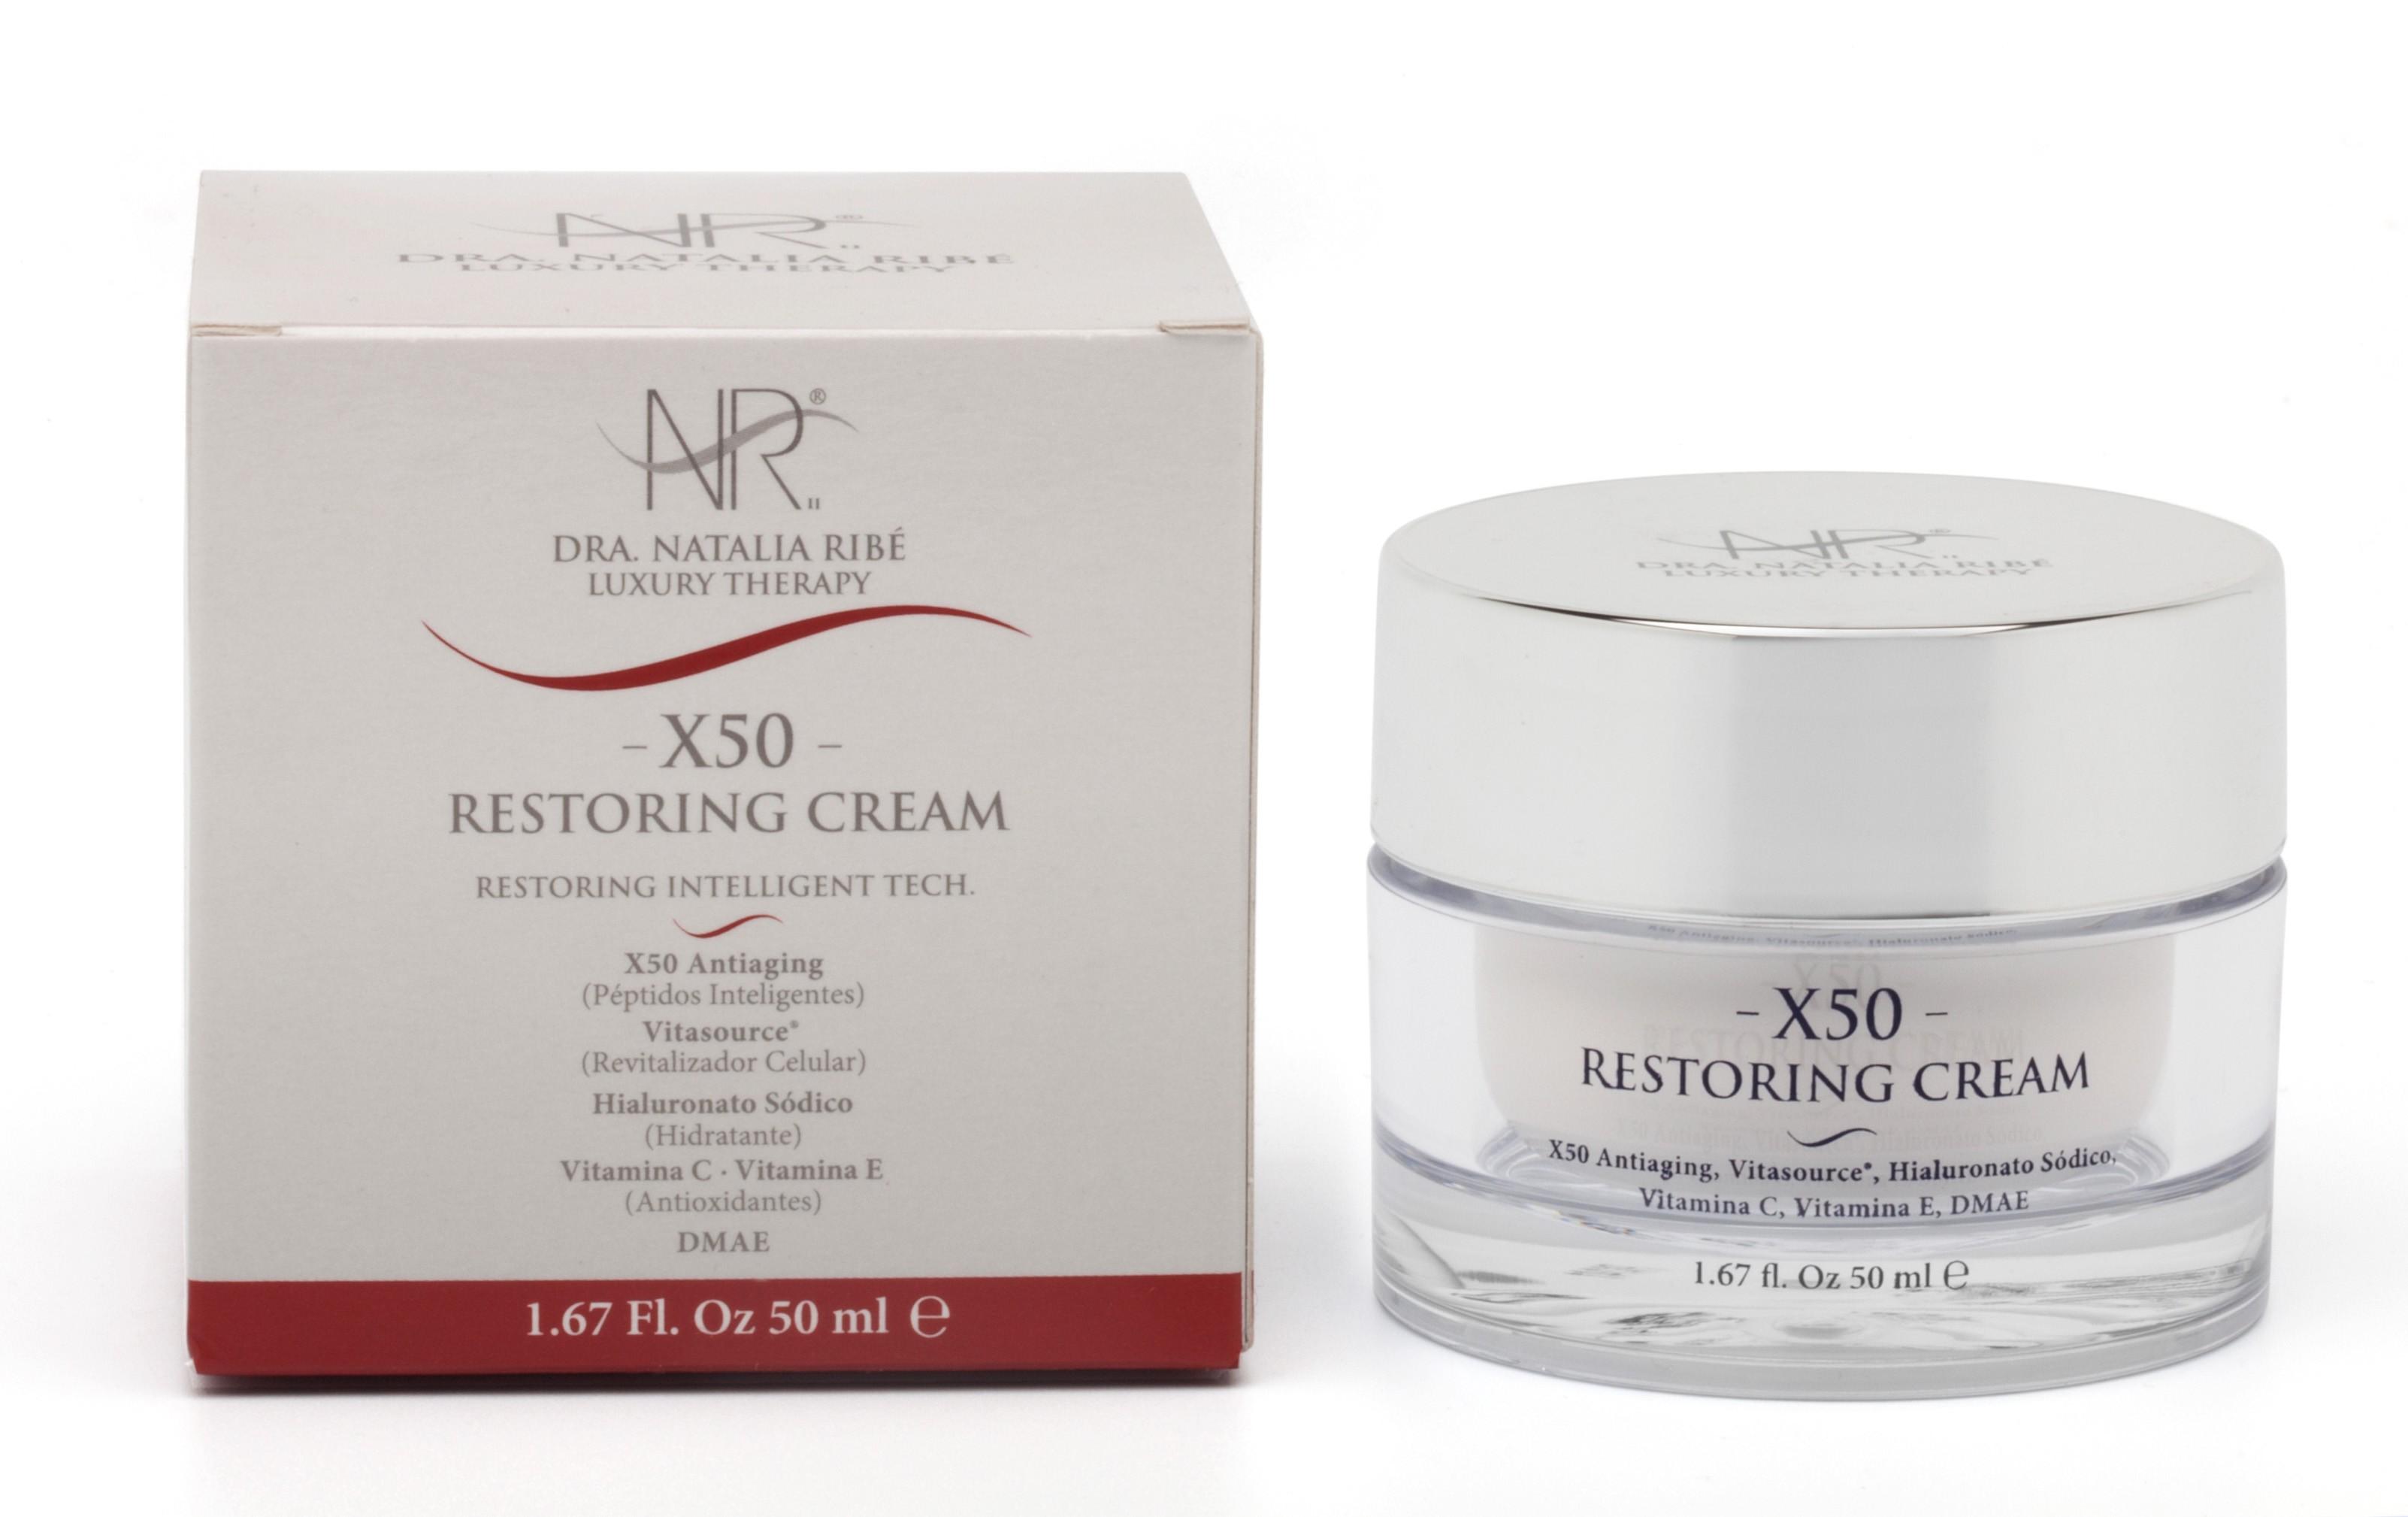 X50 Restoring Cream  - DRA. NATALIA RIBE